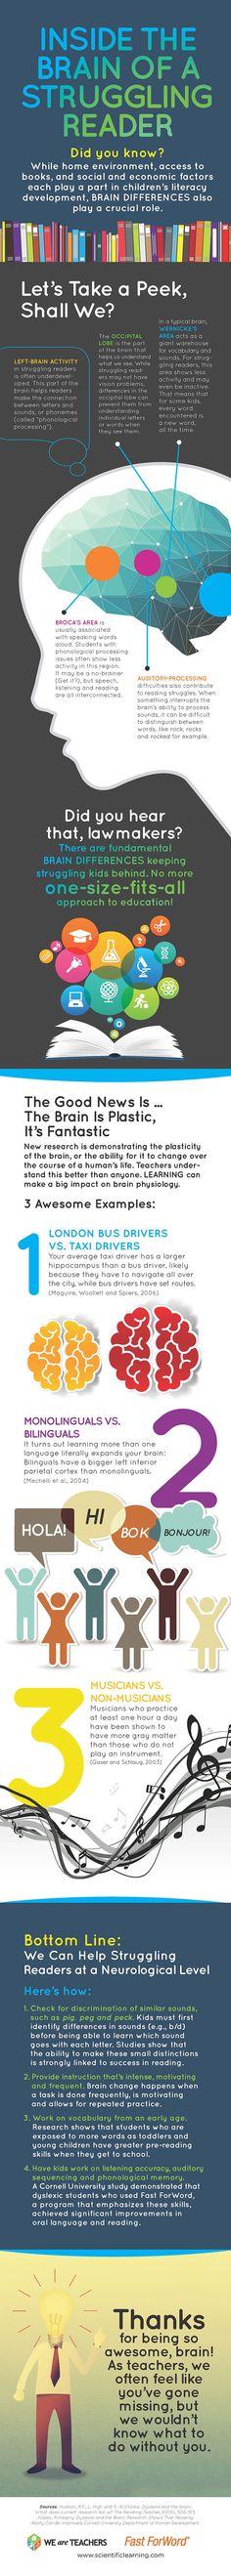 Scientific_Learning_Final-Brain-InfoPoster